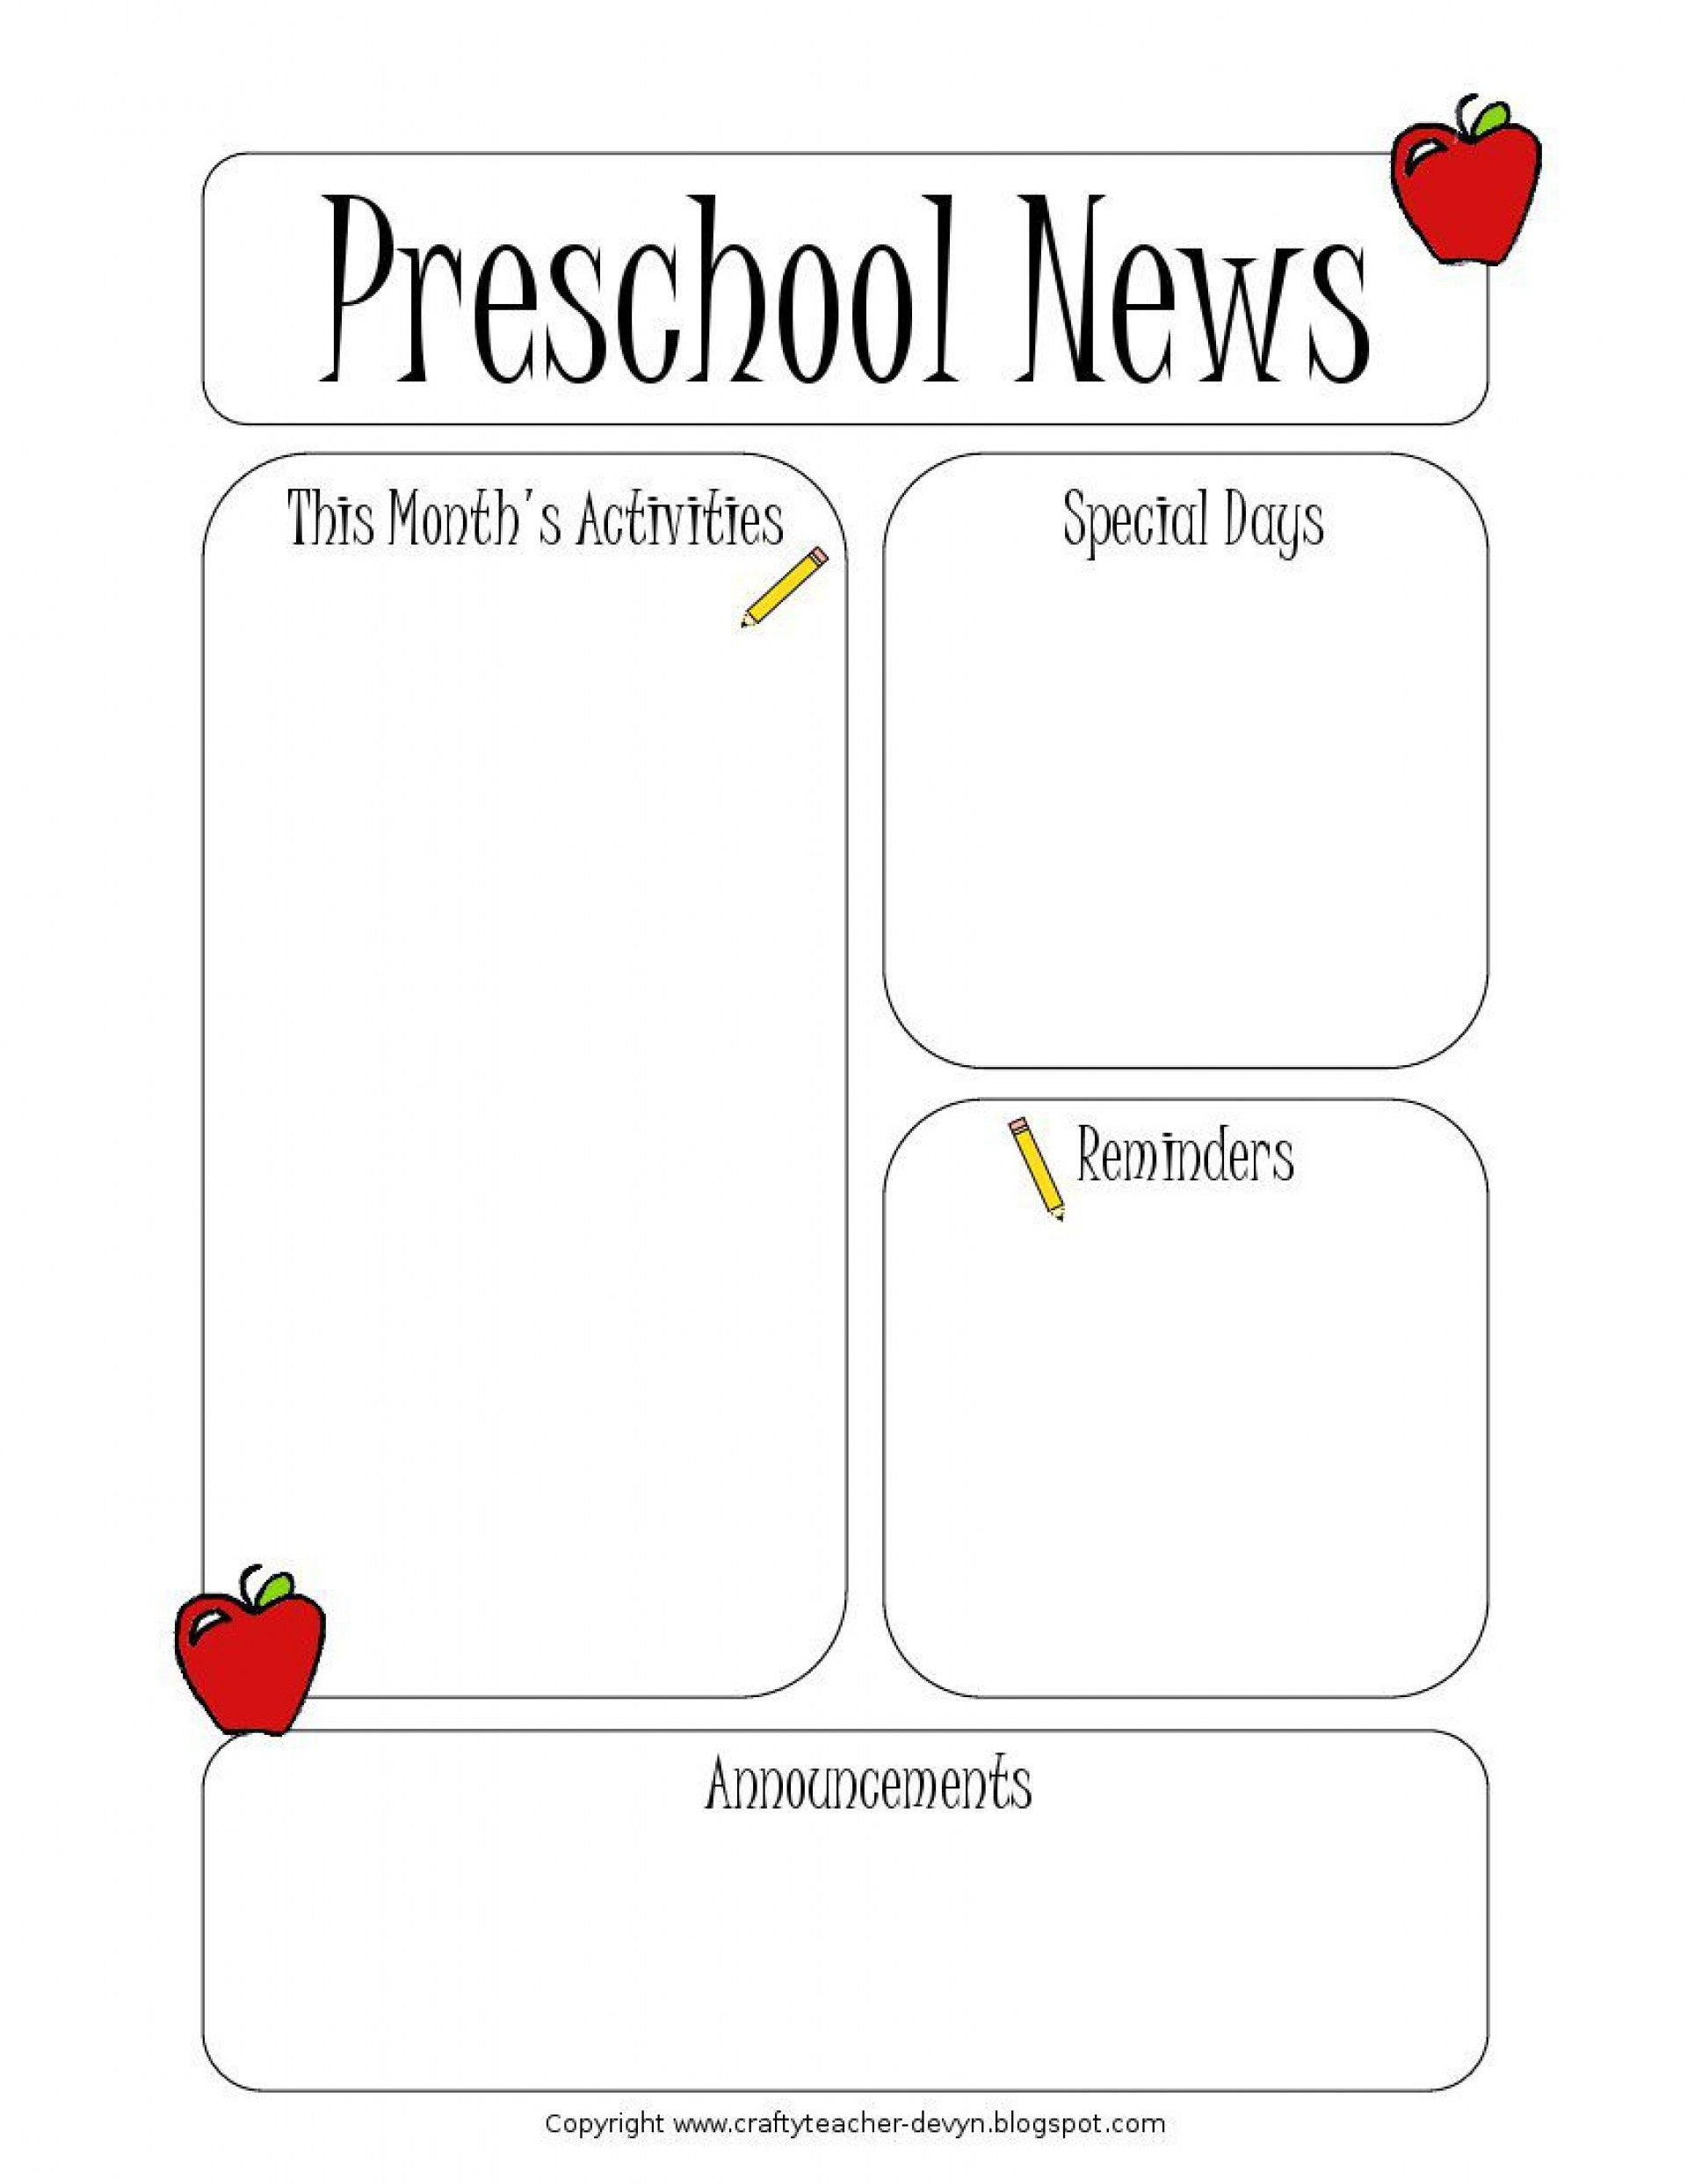 005 Wondrou Newsletter Template For Teacher Inspiration  Teachers To Parent Free Printable Digital1920